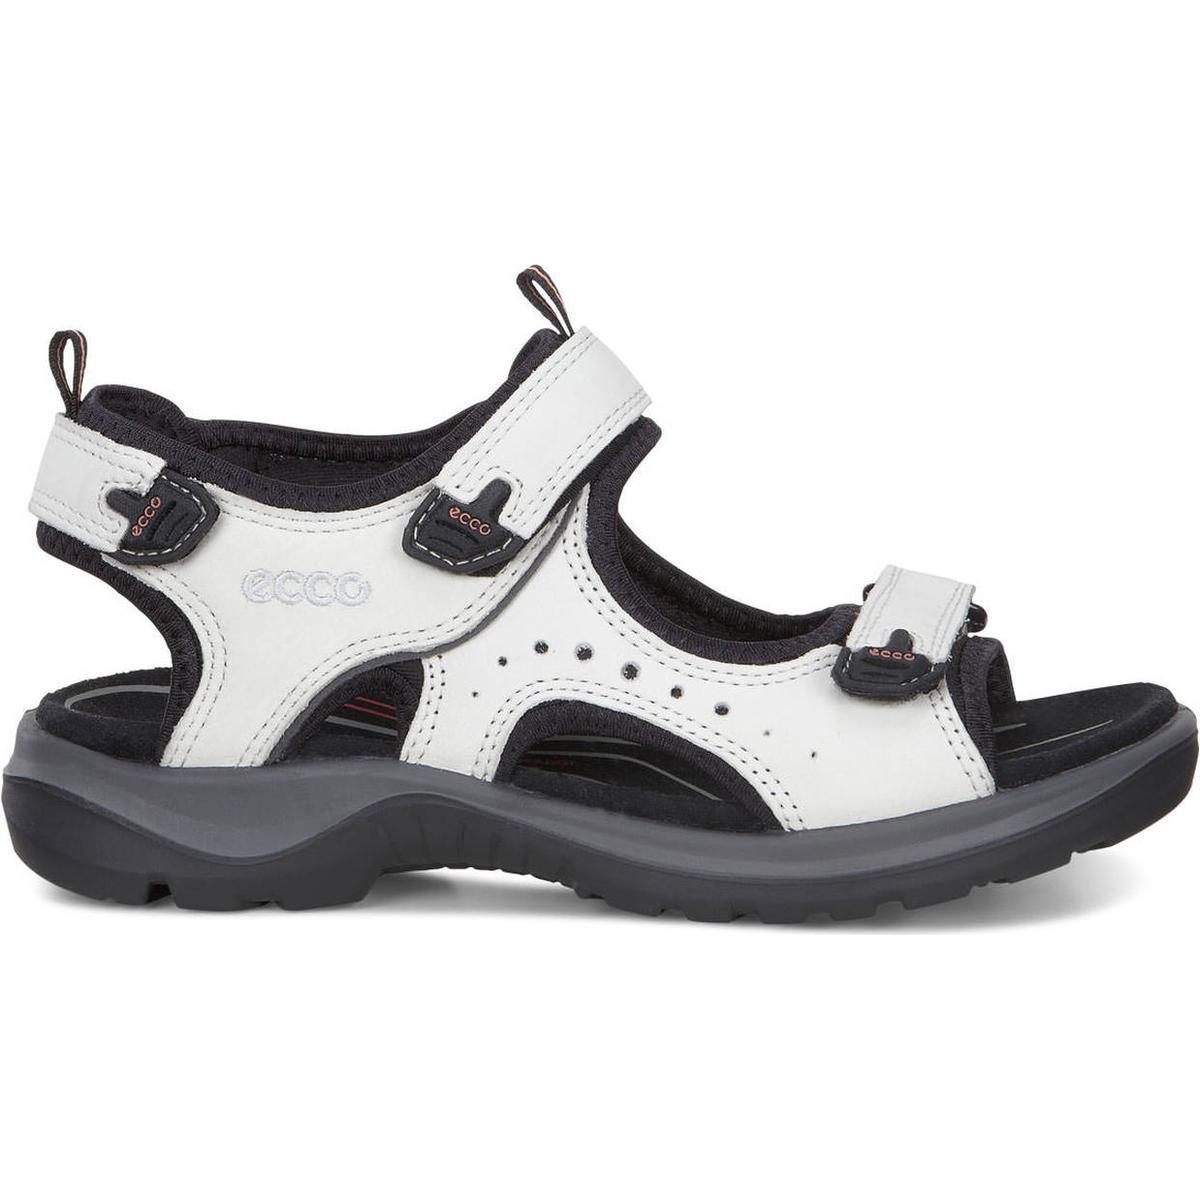 cd3f20d426b Ecco - Sammenlign priser på Ecco sko hos PriceRunner